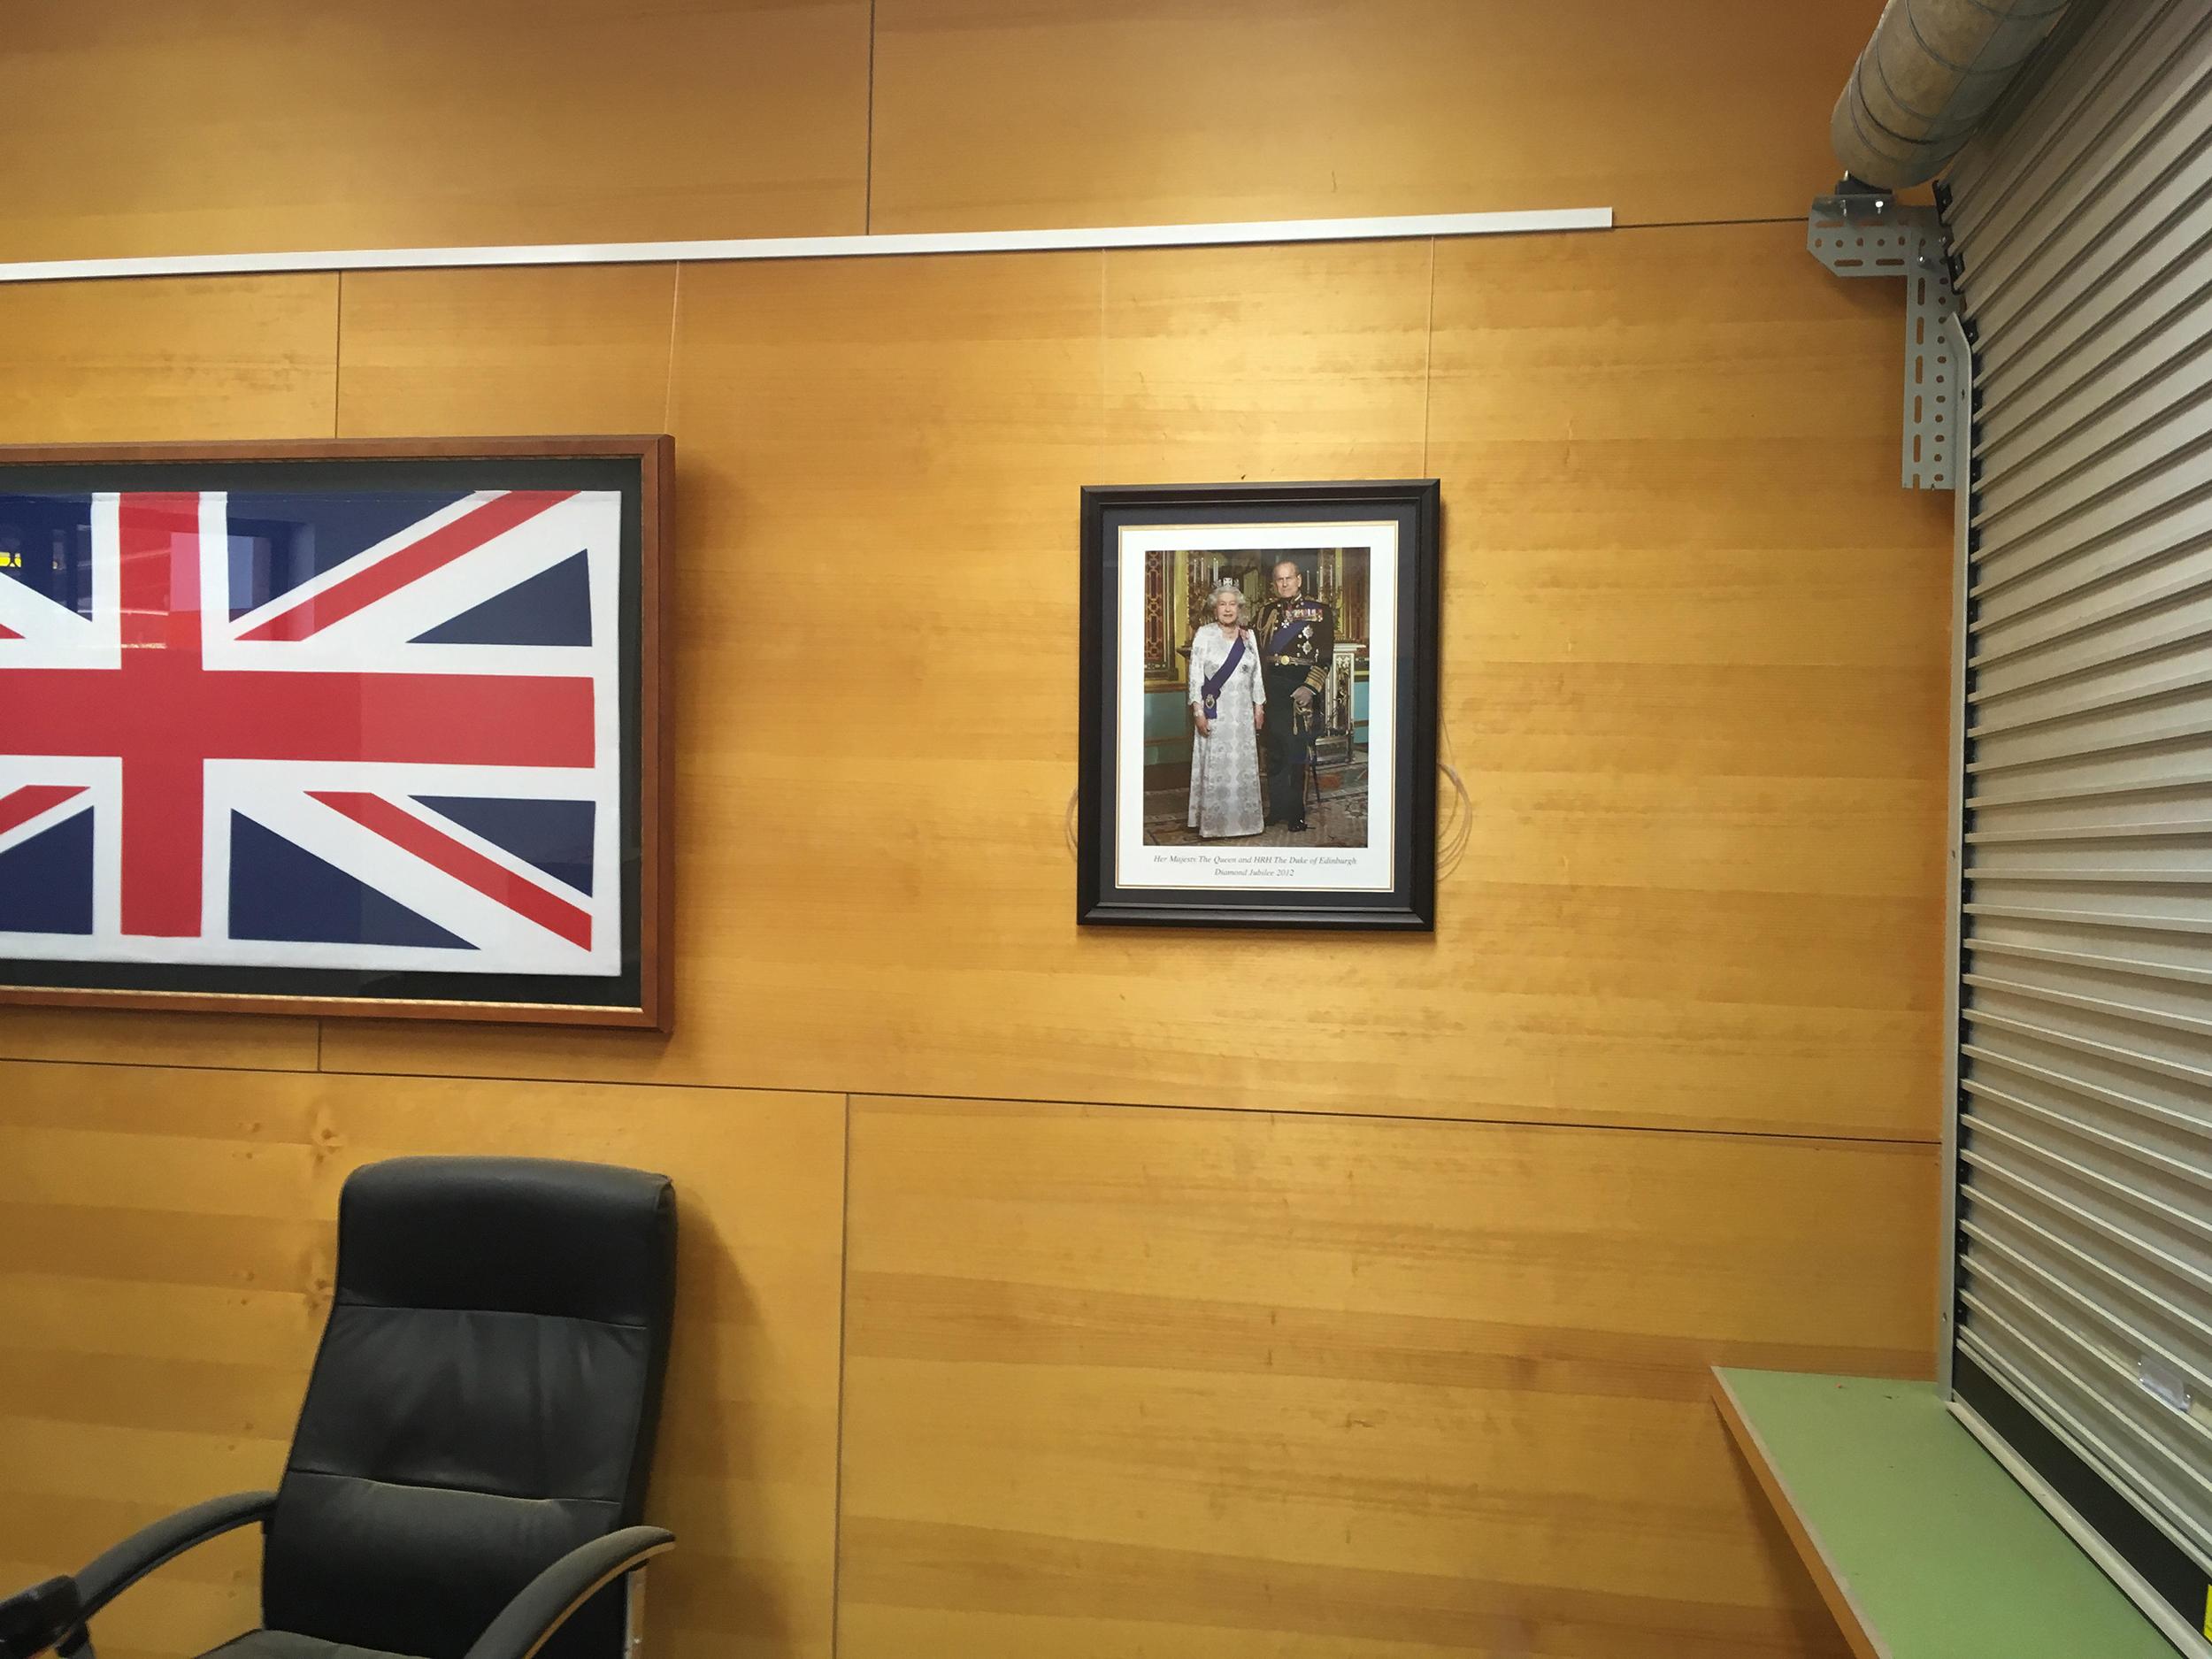 Australians-spam-politicians-for-free-portrait-of-queen-after-legislative-quirk-surfaces